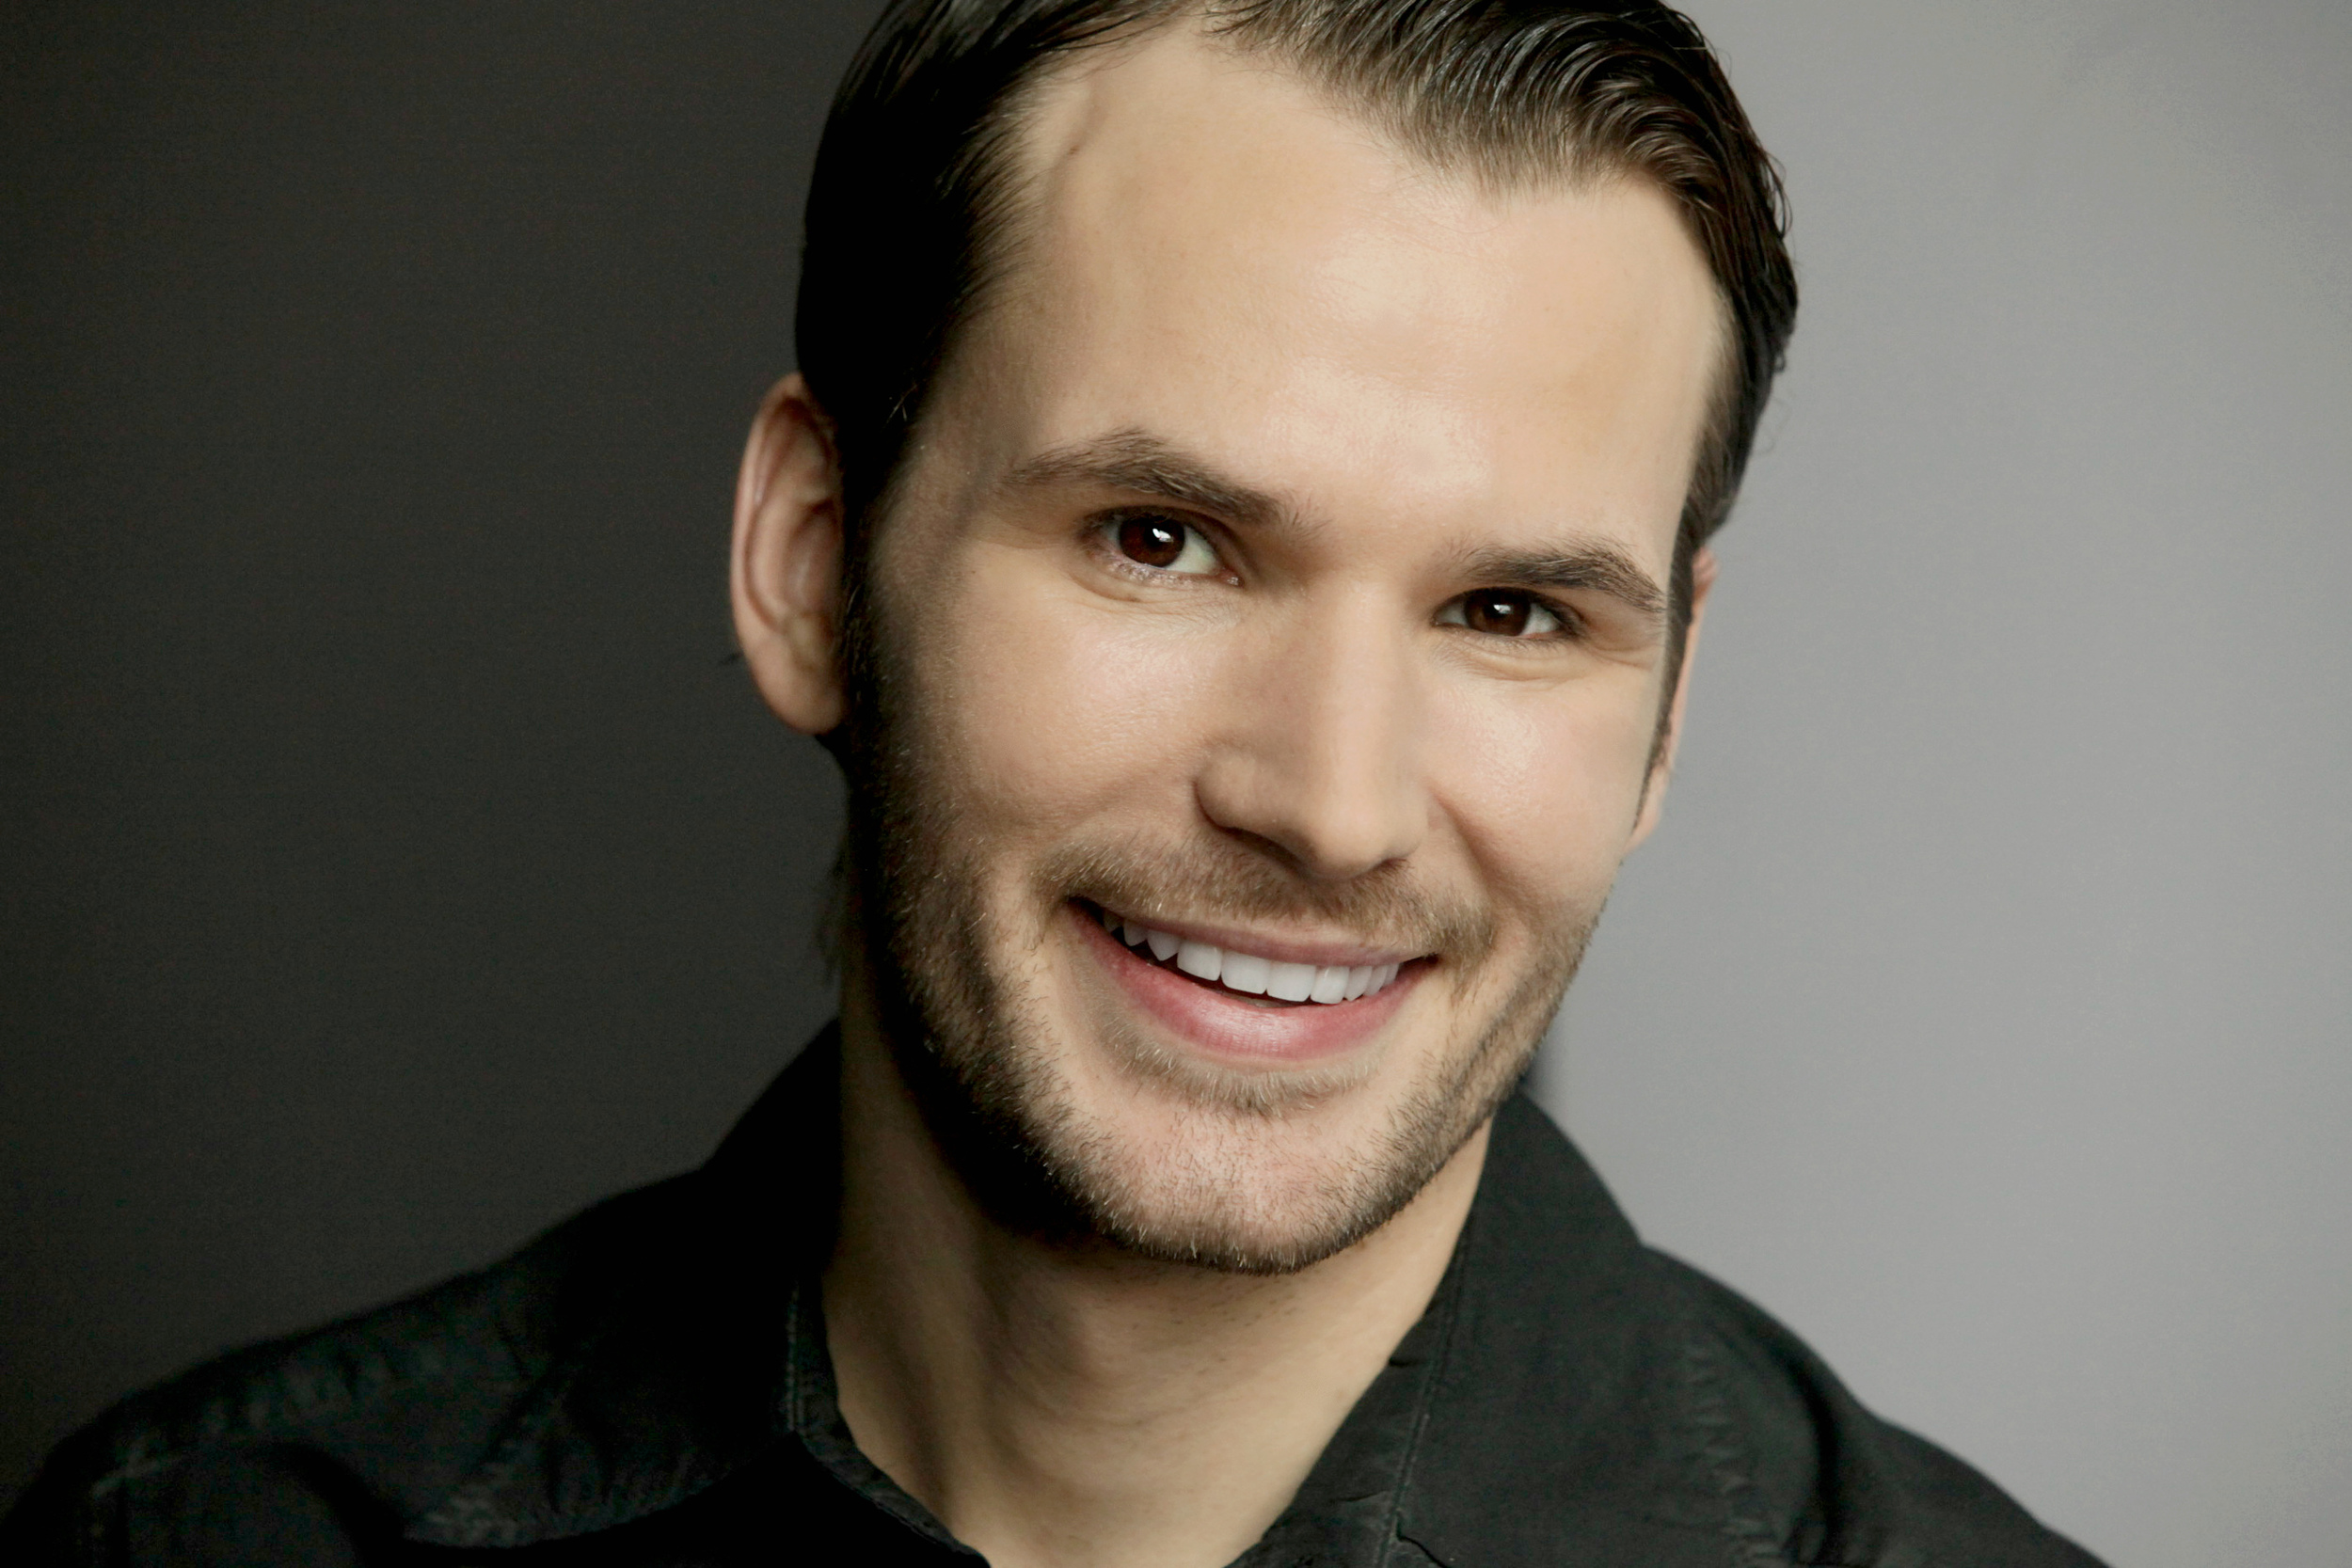 Gerard Flores smile.jpg